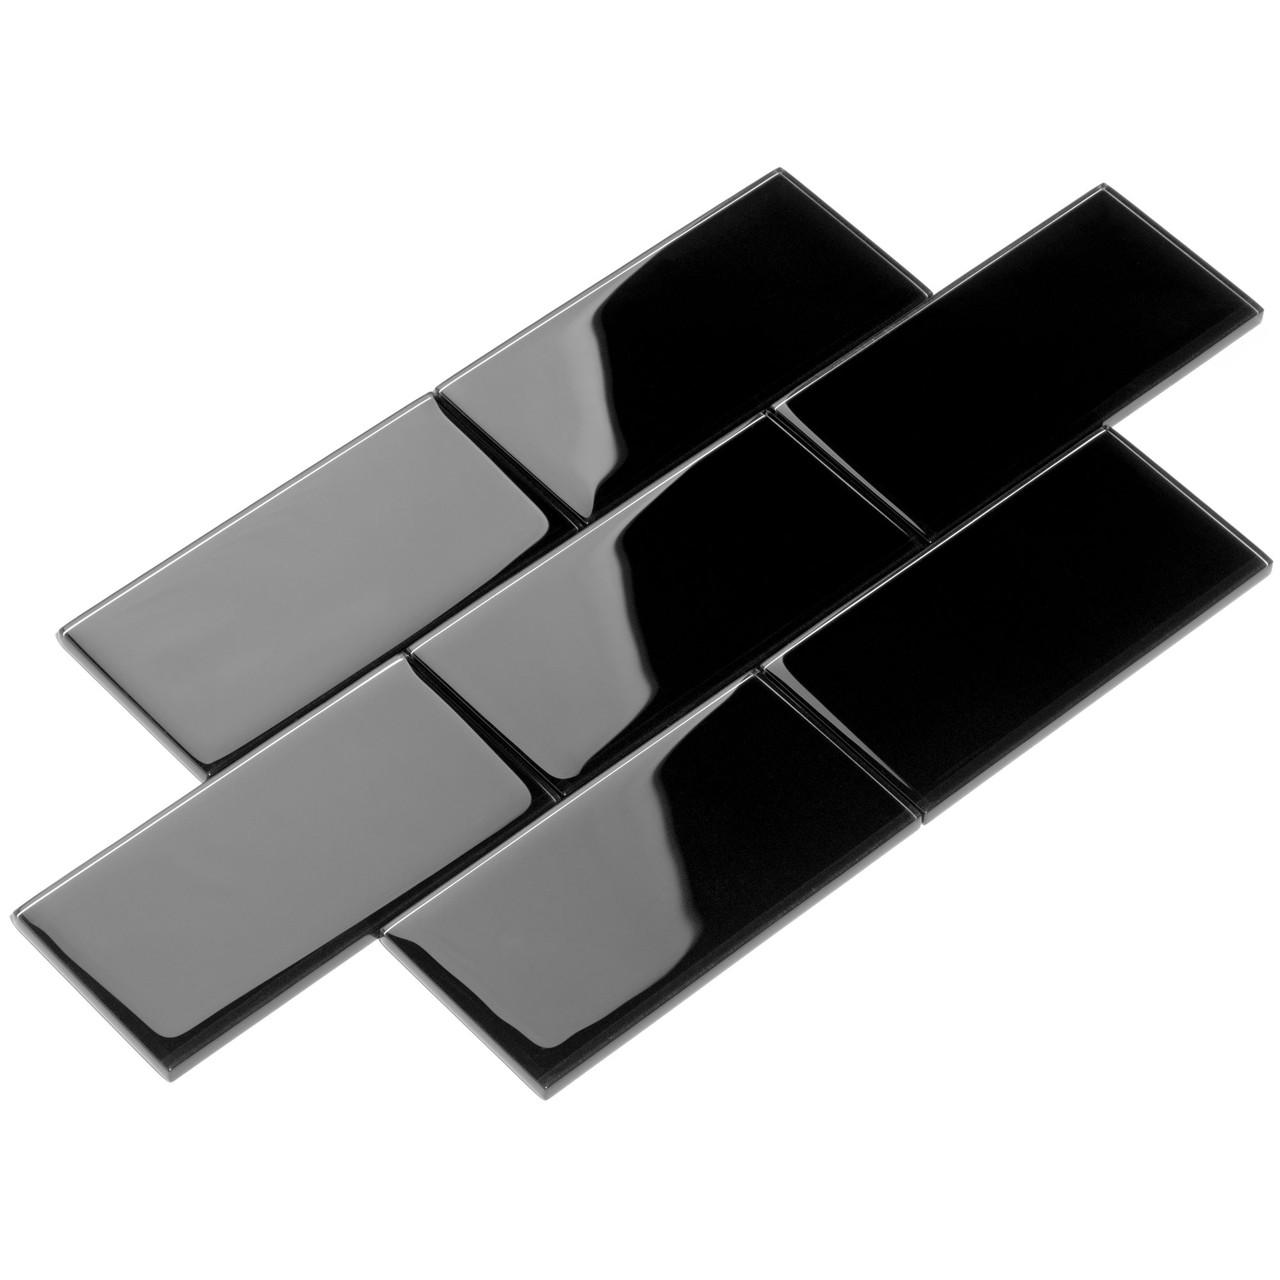 giorbello glass subway tile 3 x 6 black